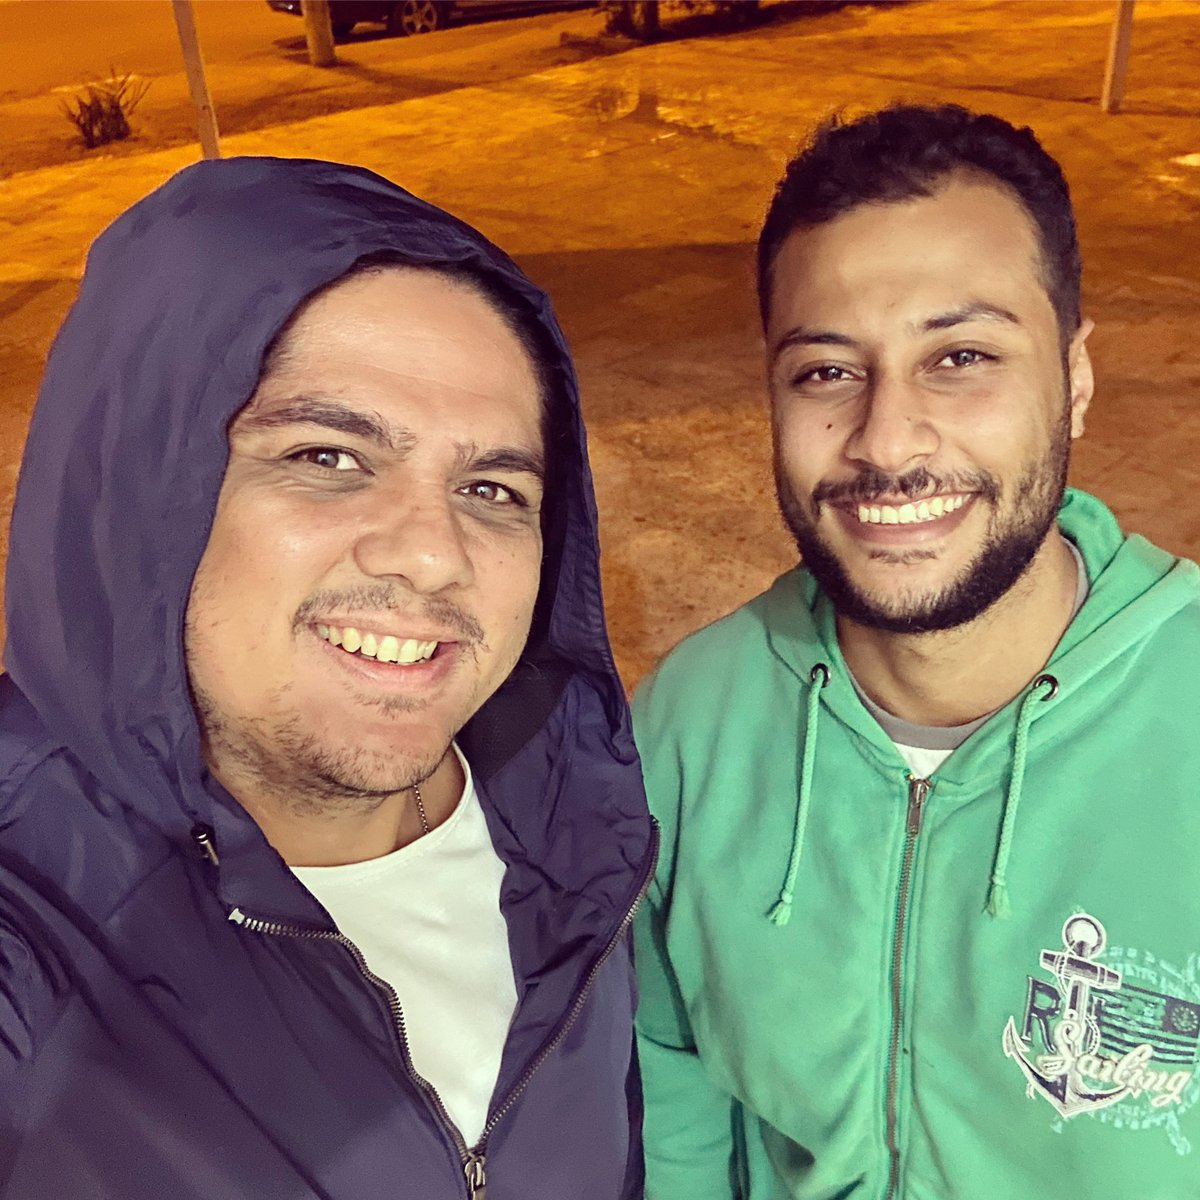 #Winter2020 #November #Abdo #Friend #CatchingUpTime #PositiveVibes #AlwaysSmile #NoughSaid